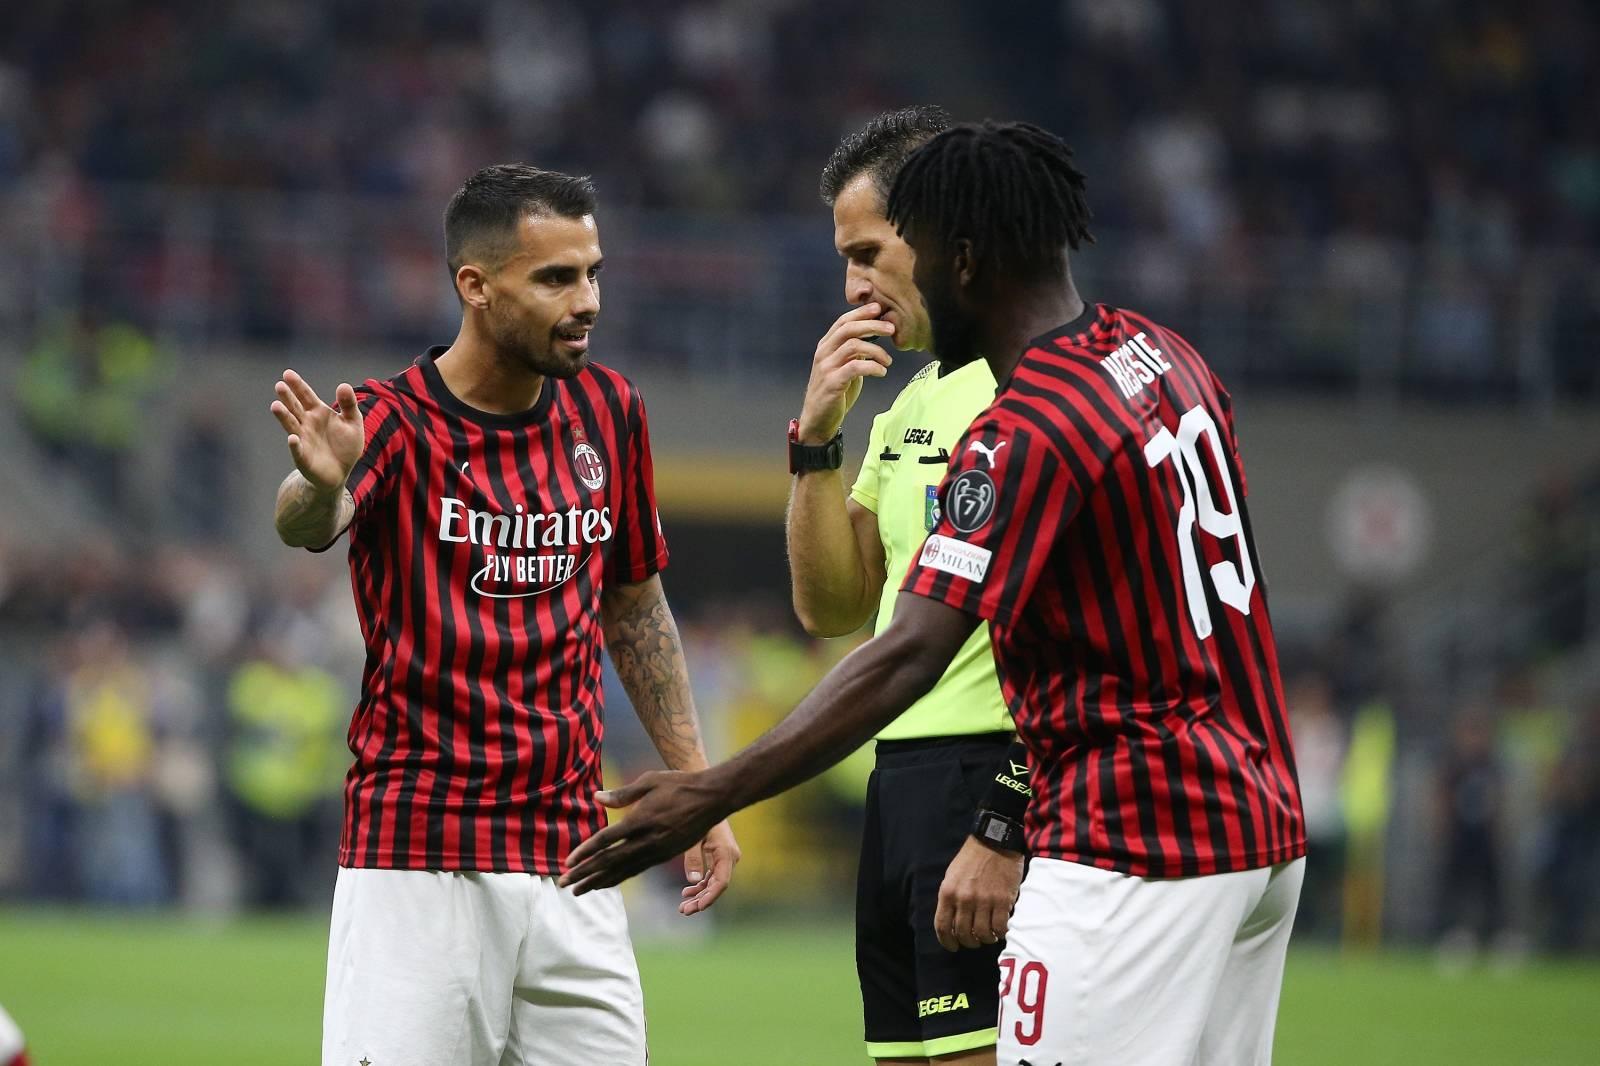 Serie A championship MILAN vs INTER 0-2 Apa Agency